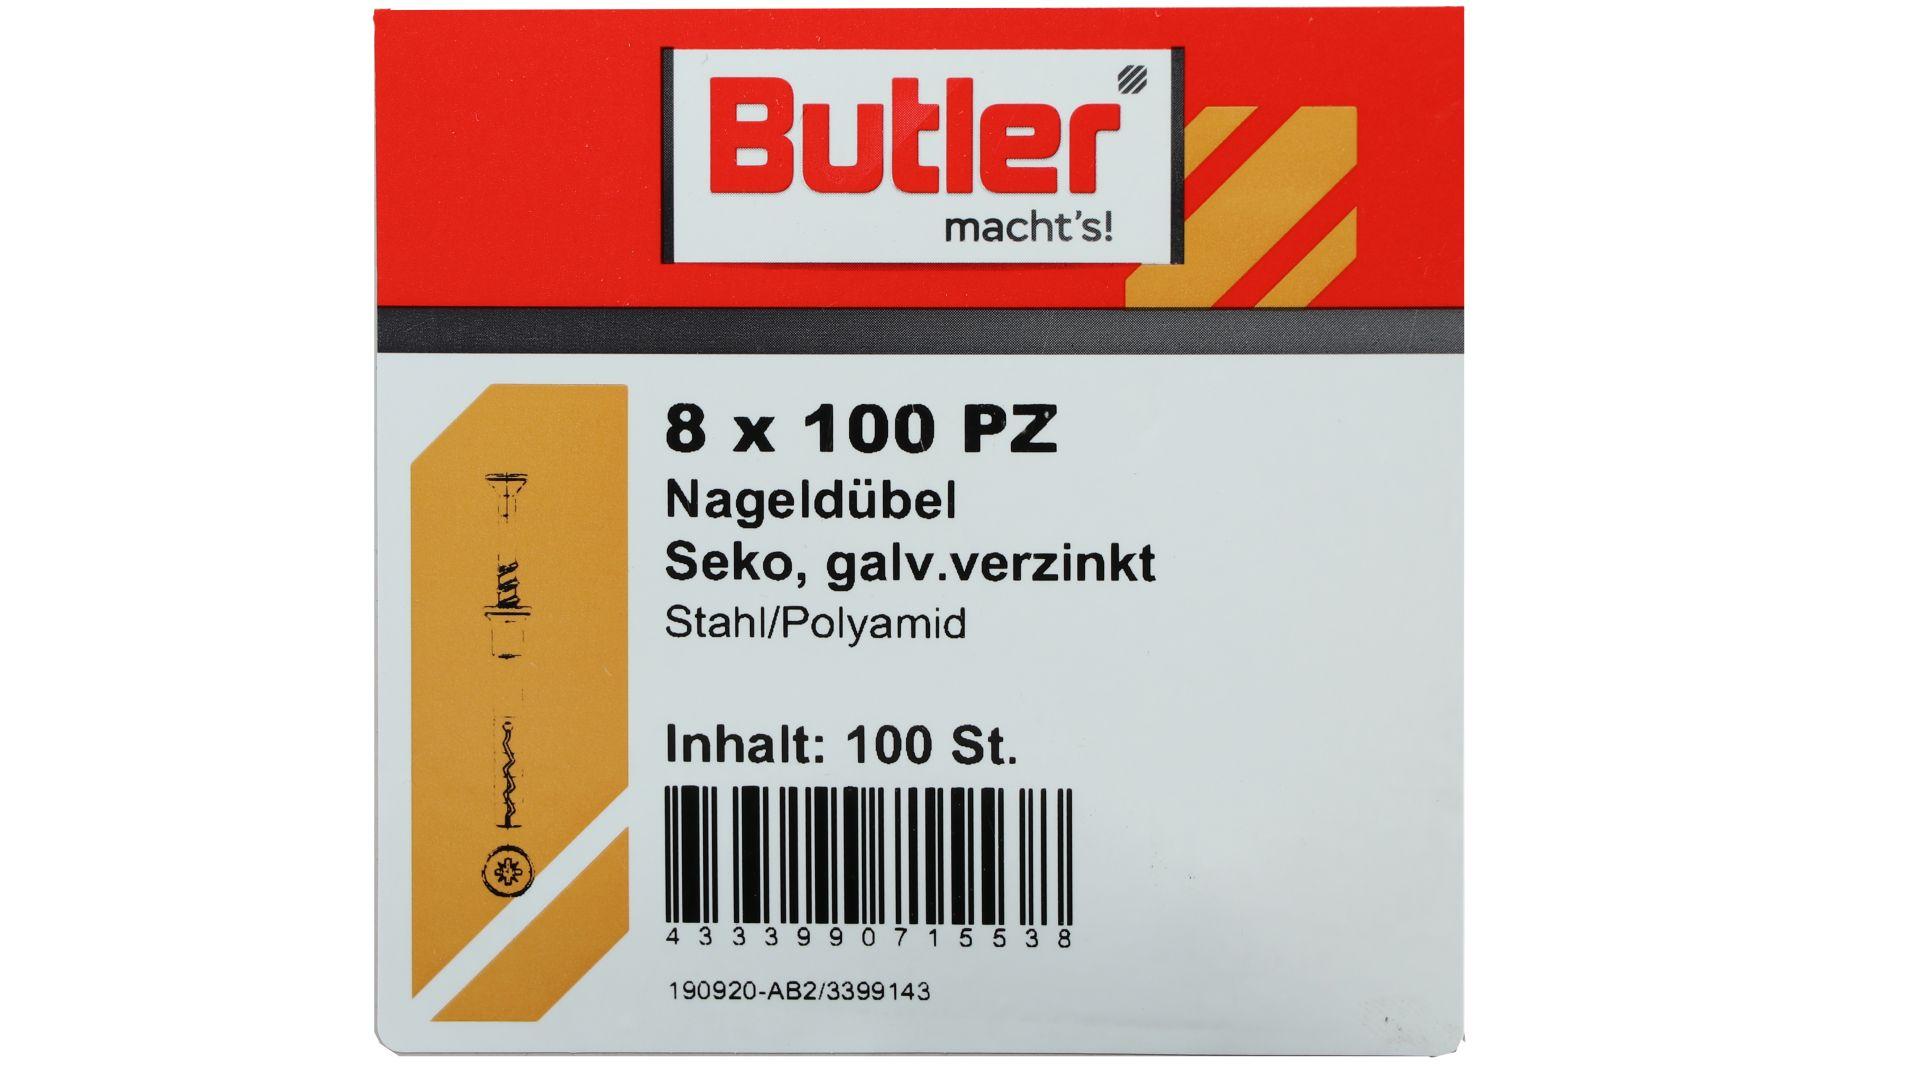 Butler macht's! Nageldübel, Stahl / Polyamid, Senkkopf, galvanisch verzinkt 8 x 100 mm, 100 Stück